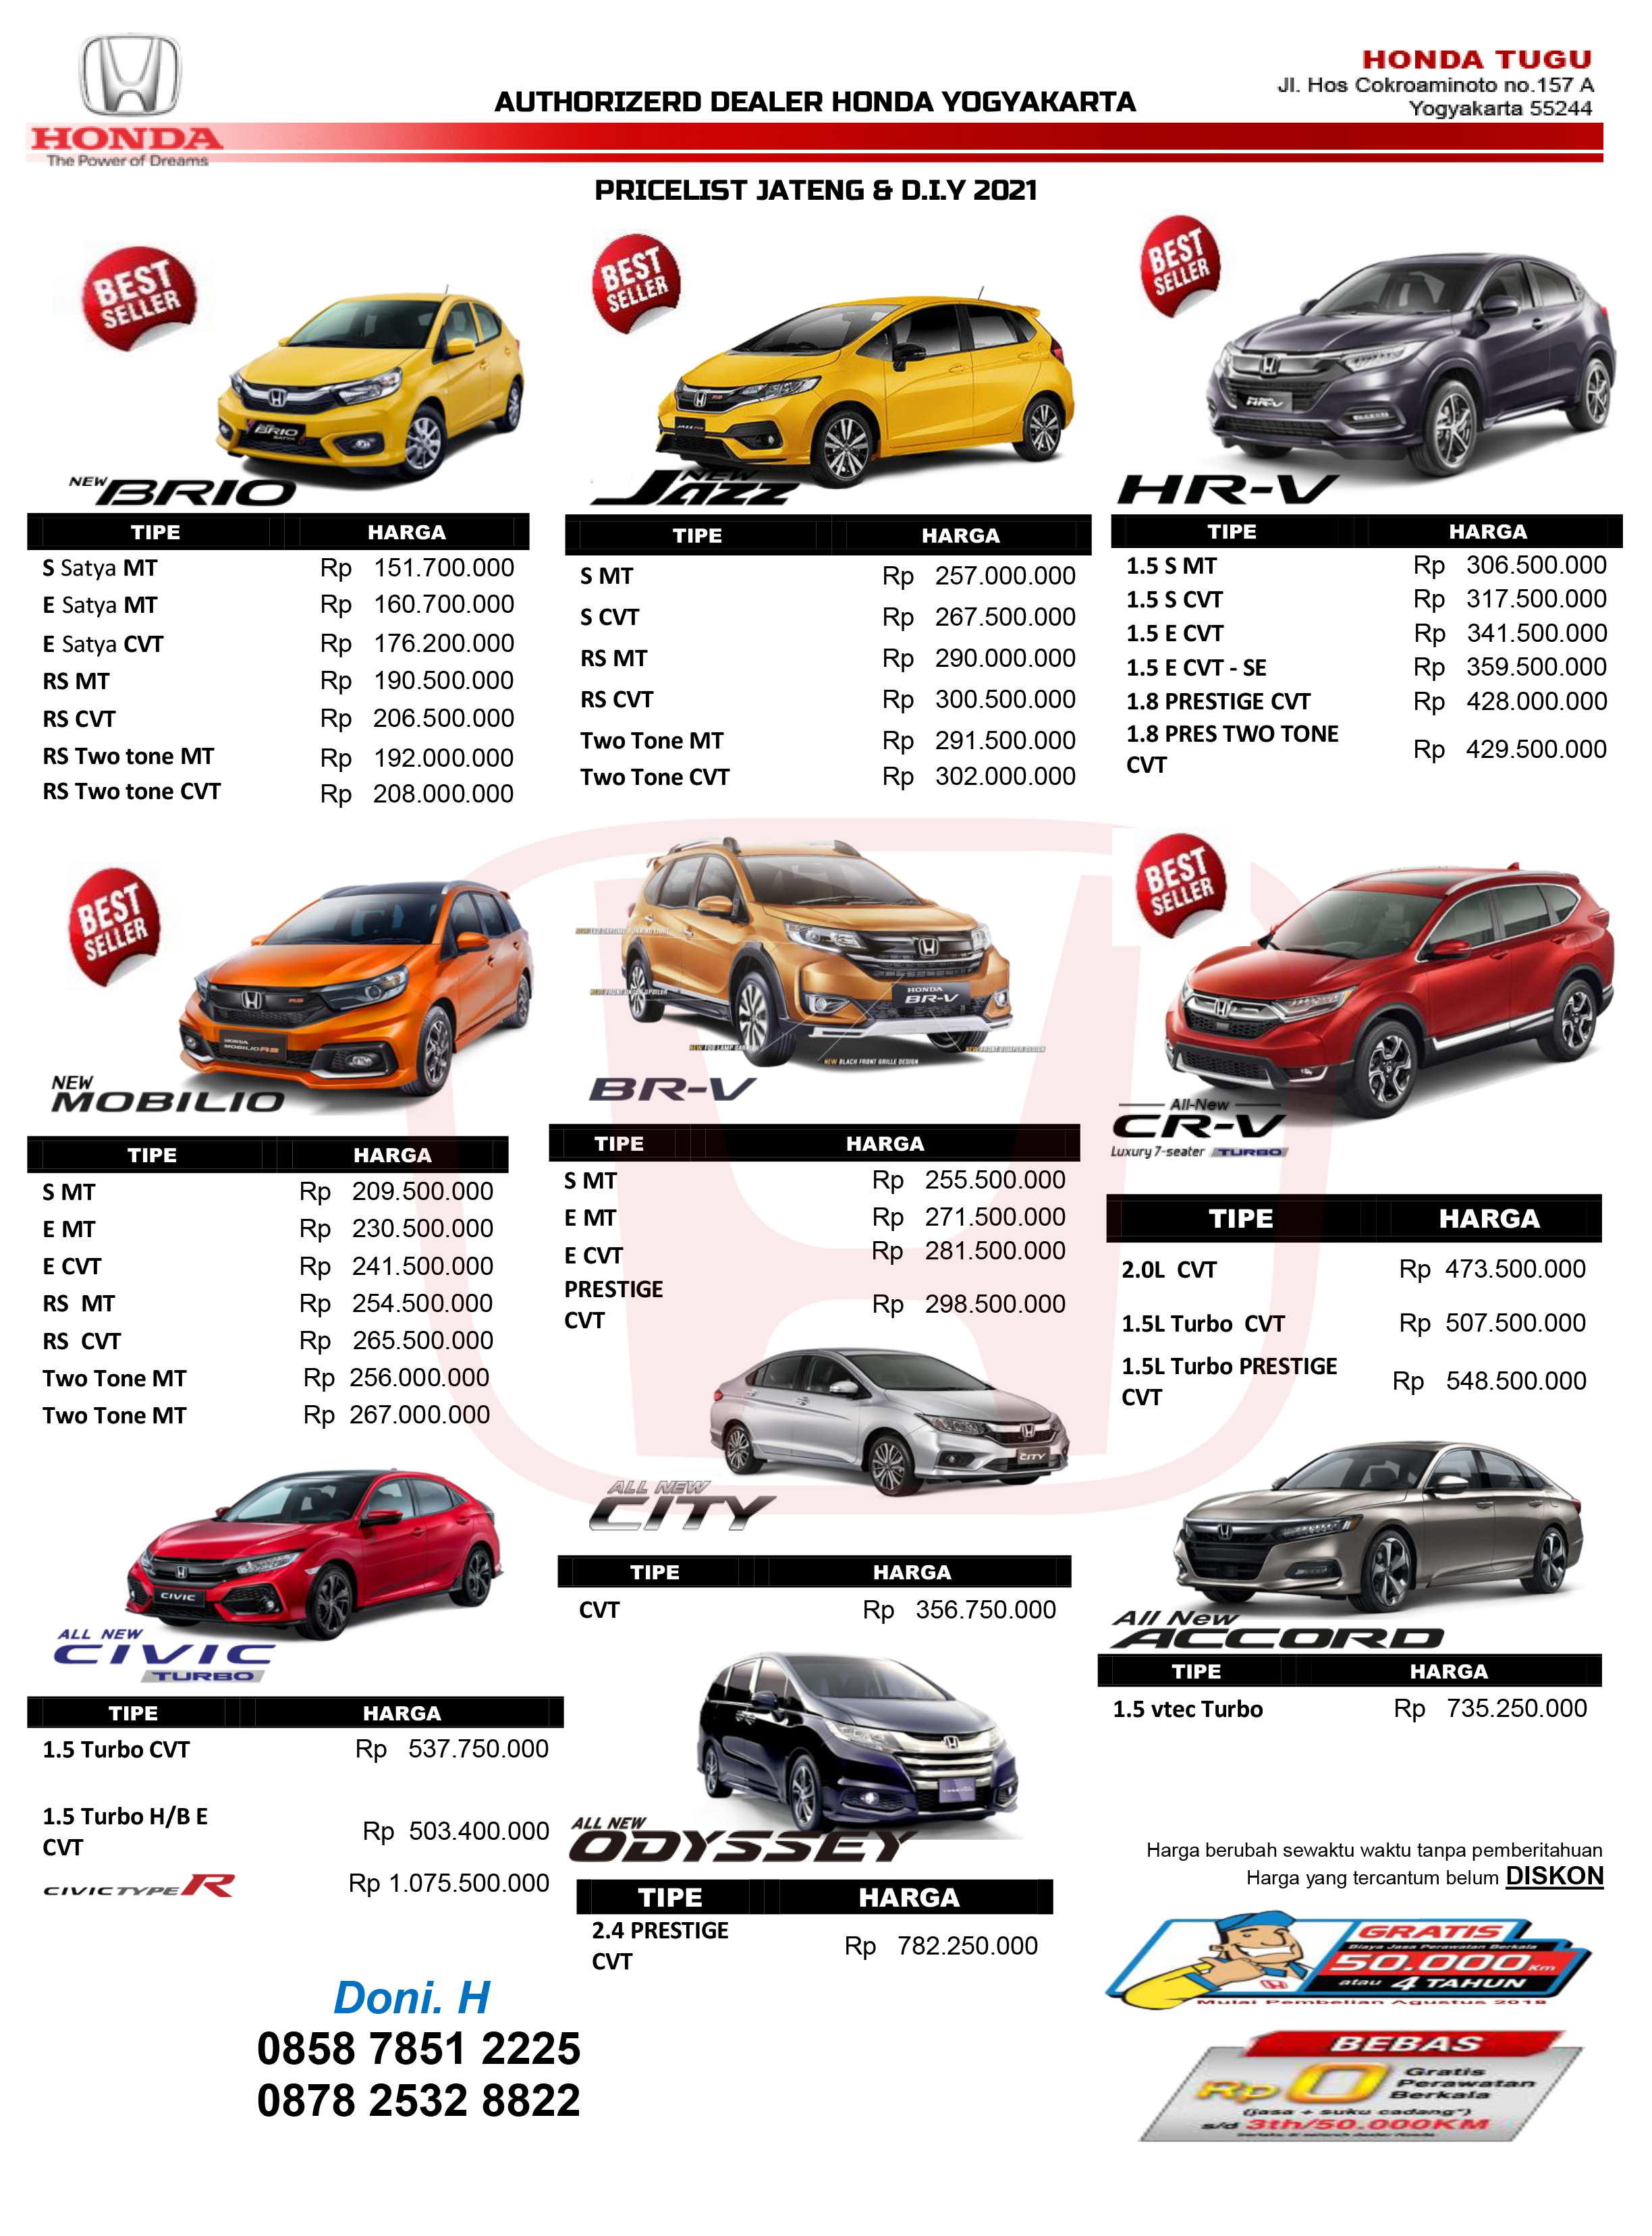 Pricelist Honda Jogja Info Honda Jogja Dealer Resmi Mobil Honda Yogyakarta